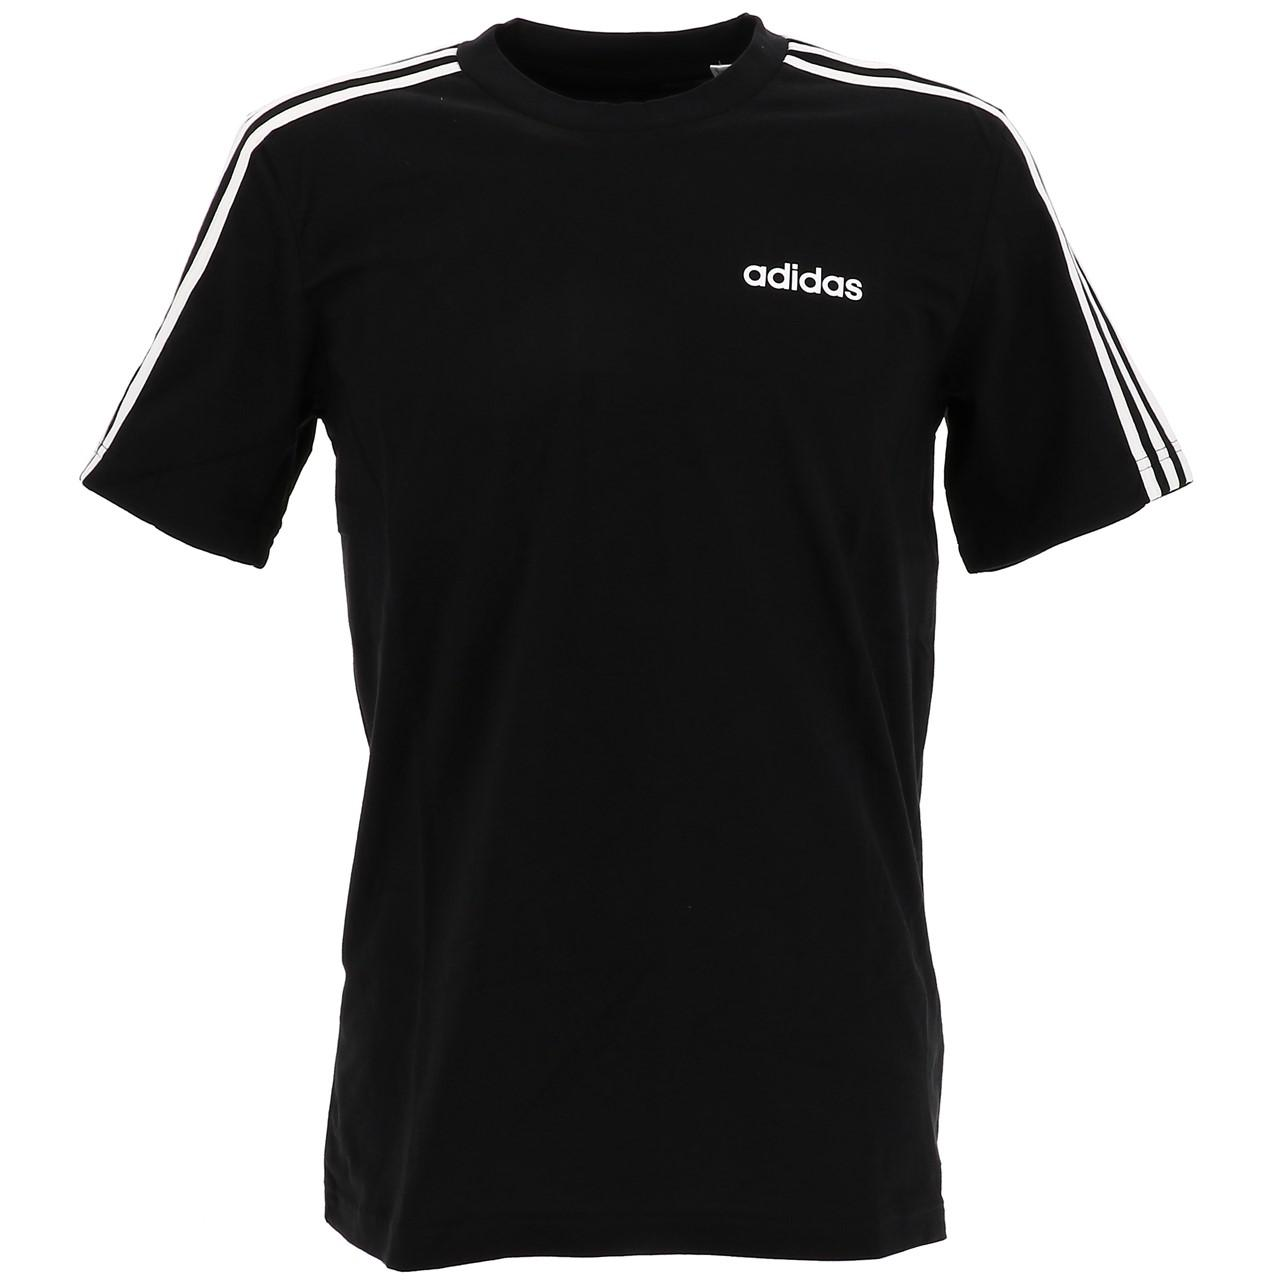 Short-Adidas-E-3s-Mc-Tee-Black-Wht-Black-16694-New